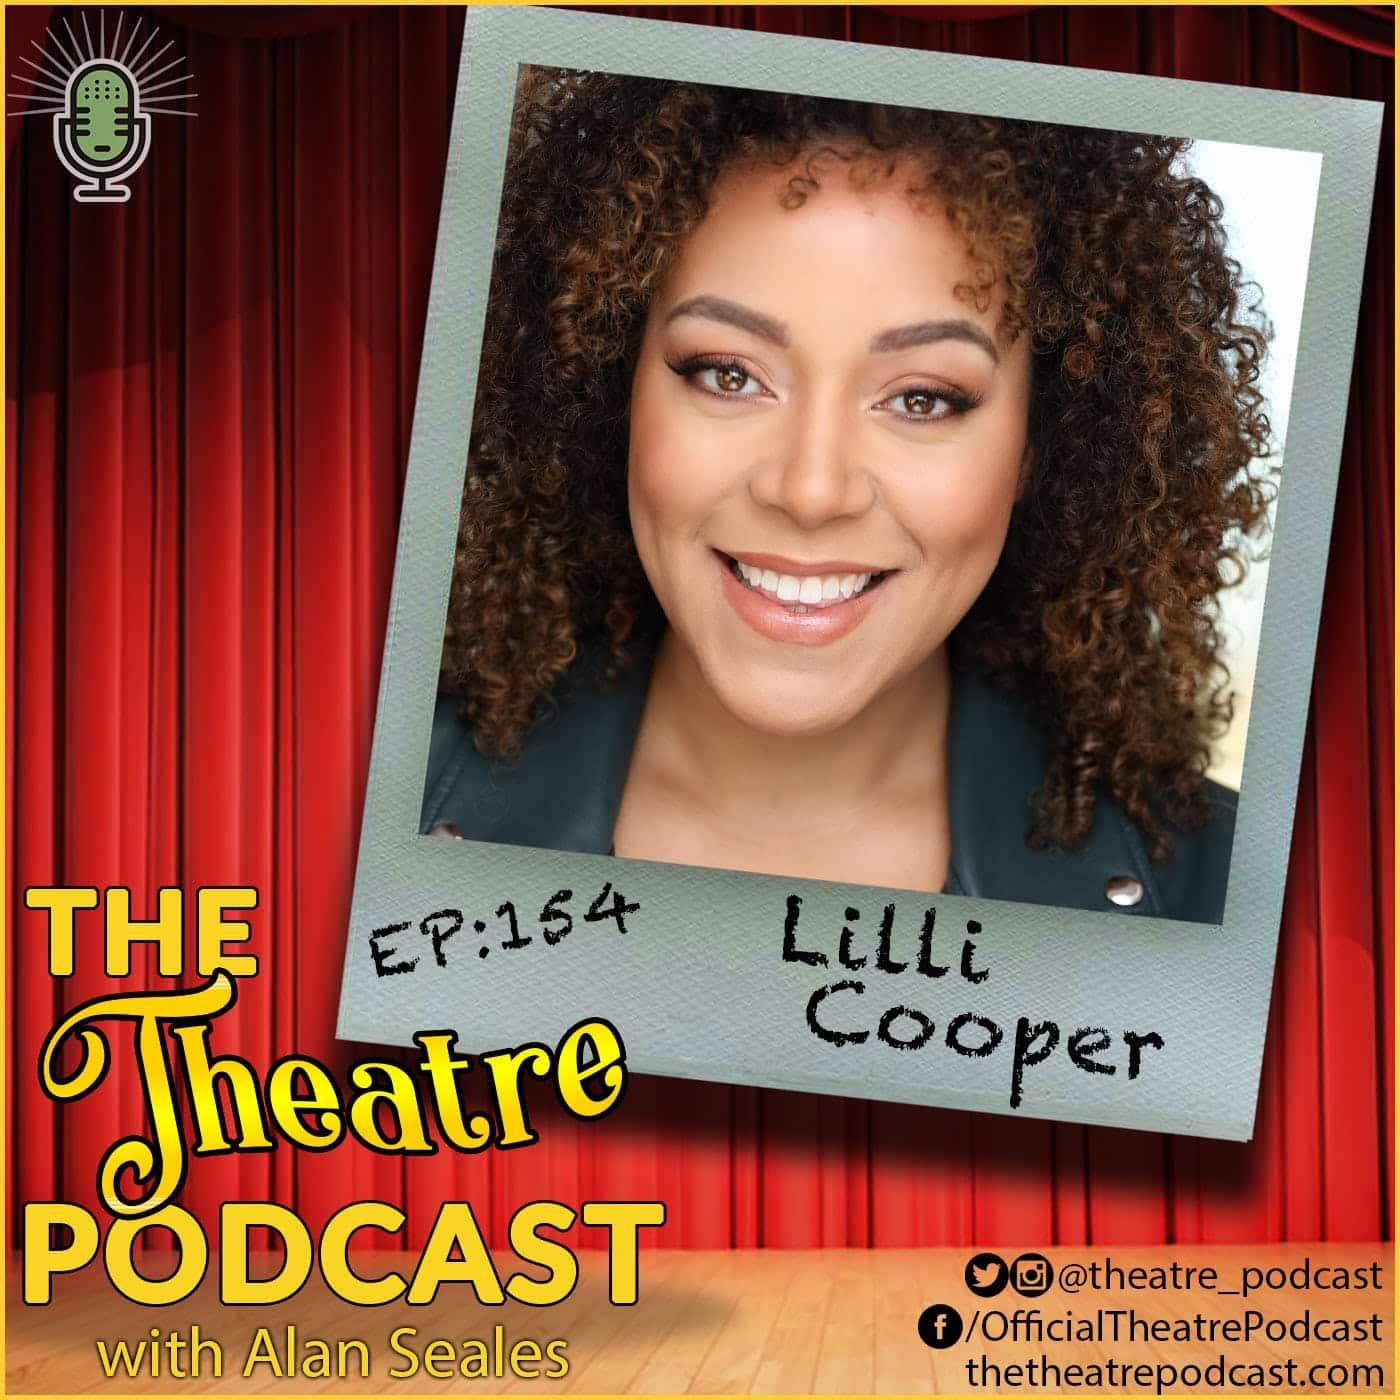 Ep154 - Lilli Cooper - Tootsie, Spongebob Squarepants, Spring Awaking ... and motherhood!